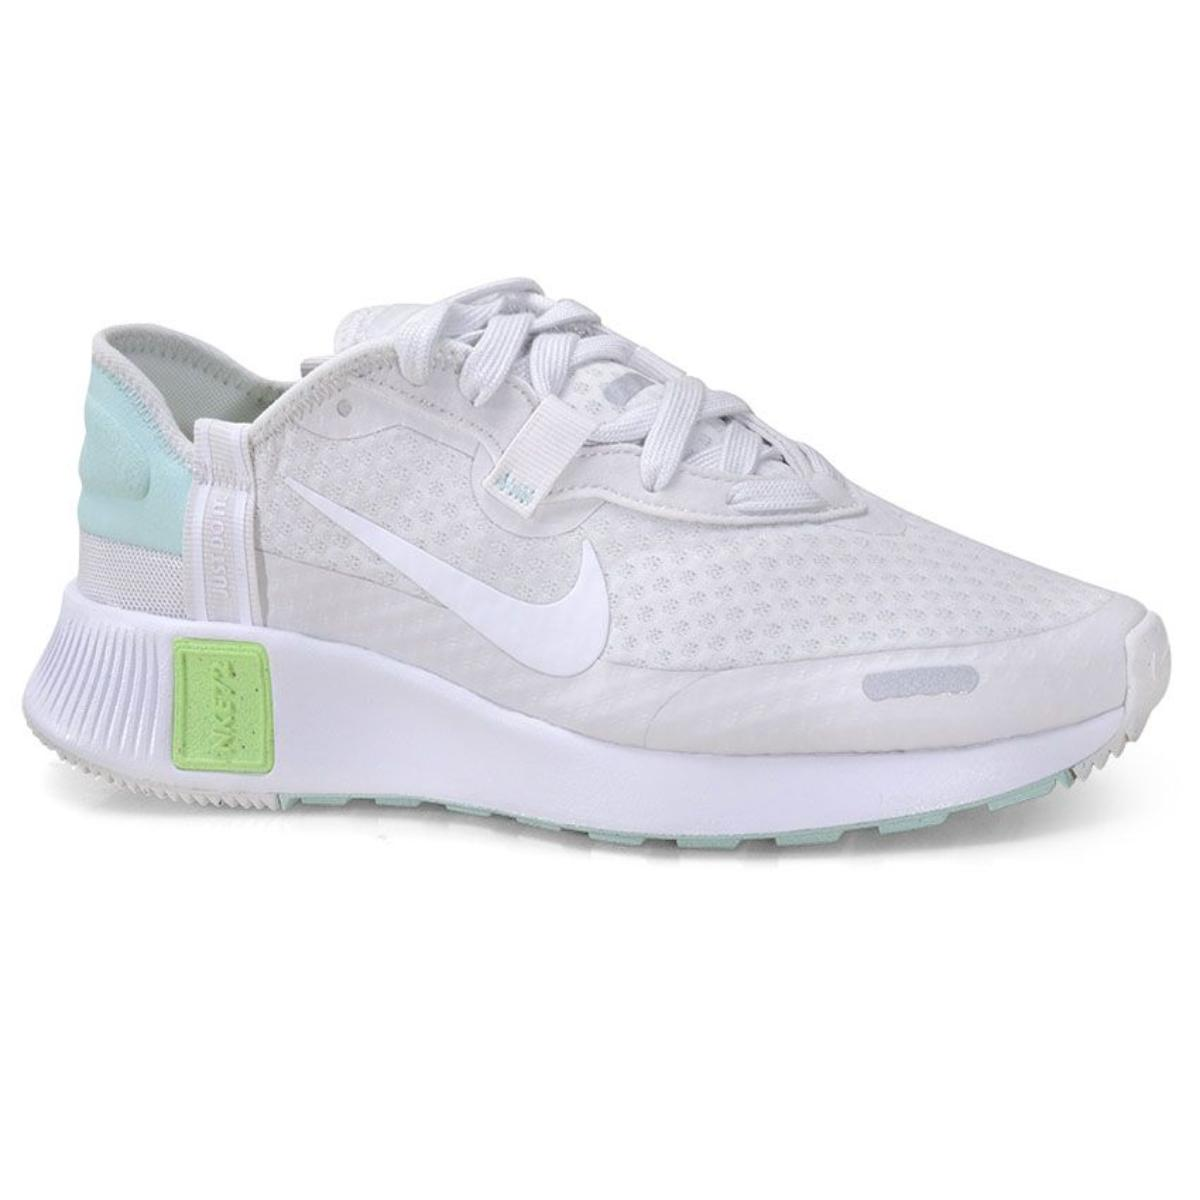 Tênis Feminino Nike Cz5630-013 Reposto Branco/cinza/verde